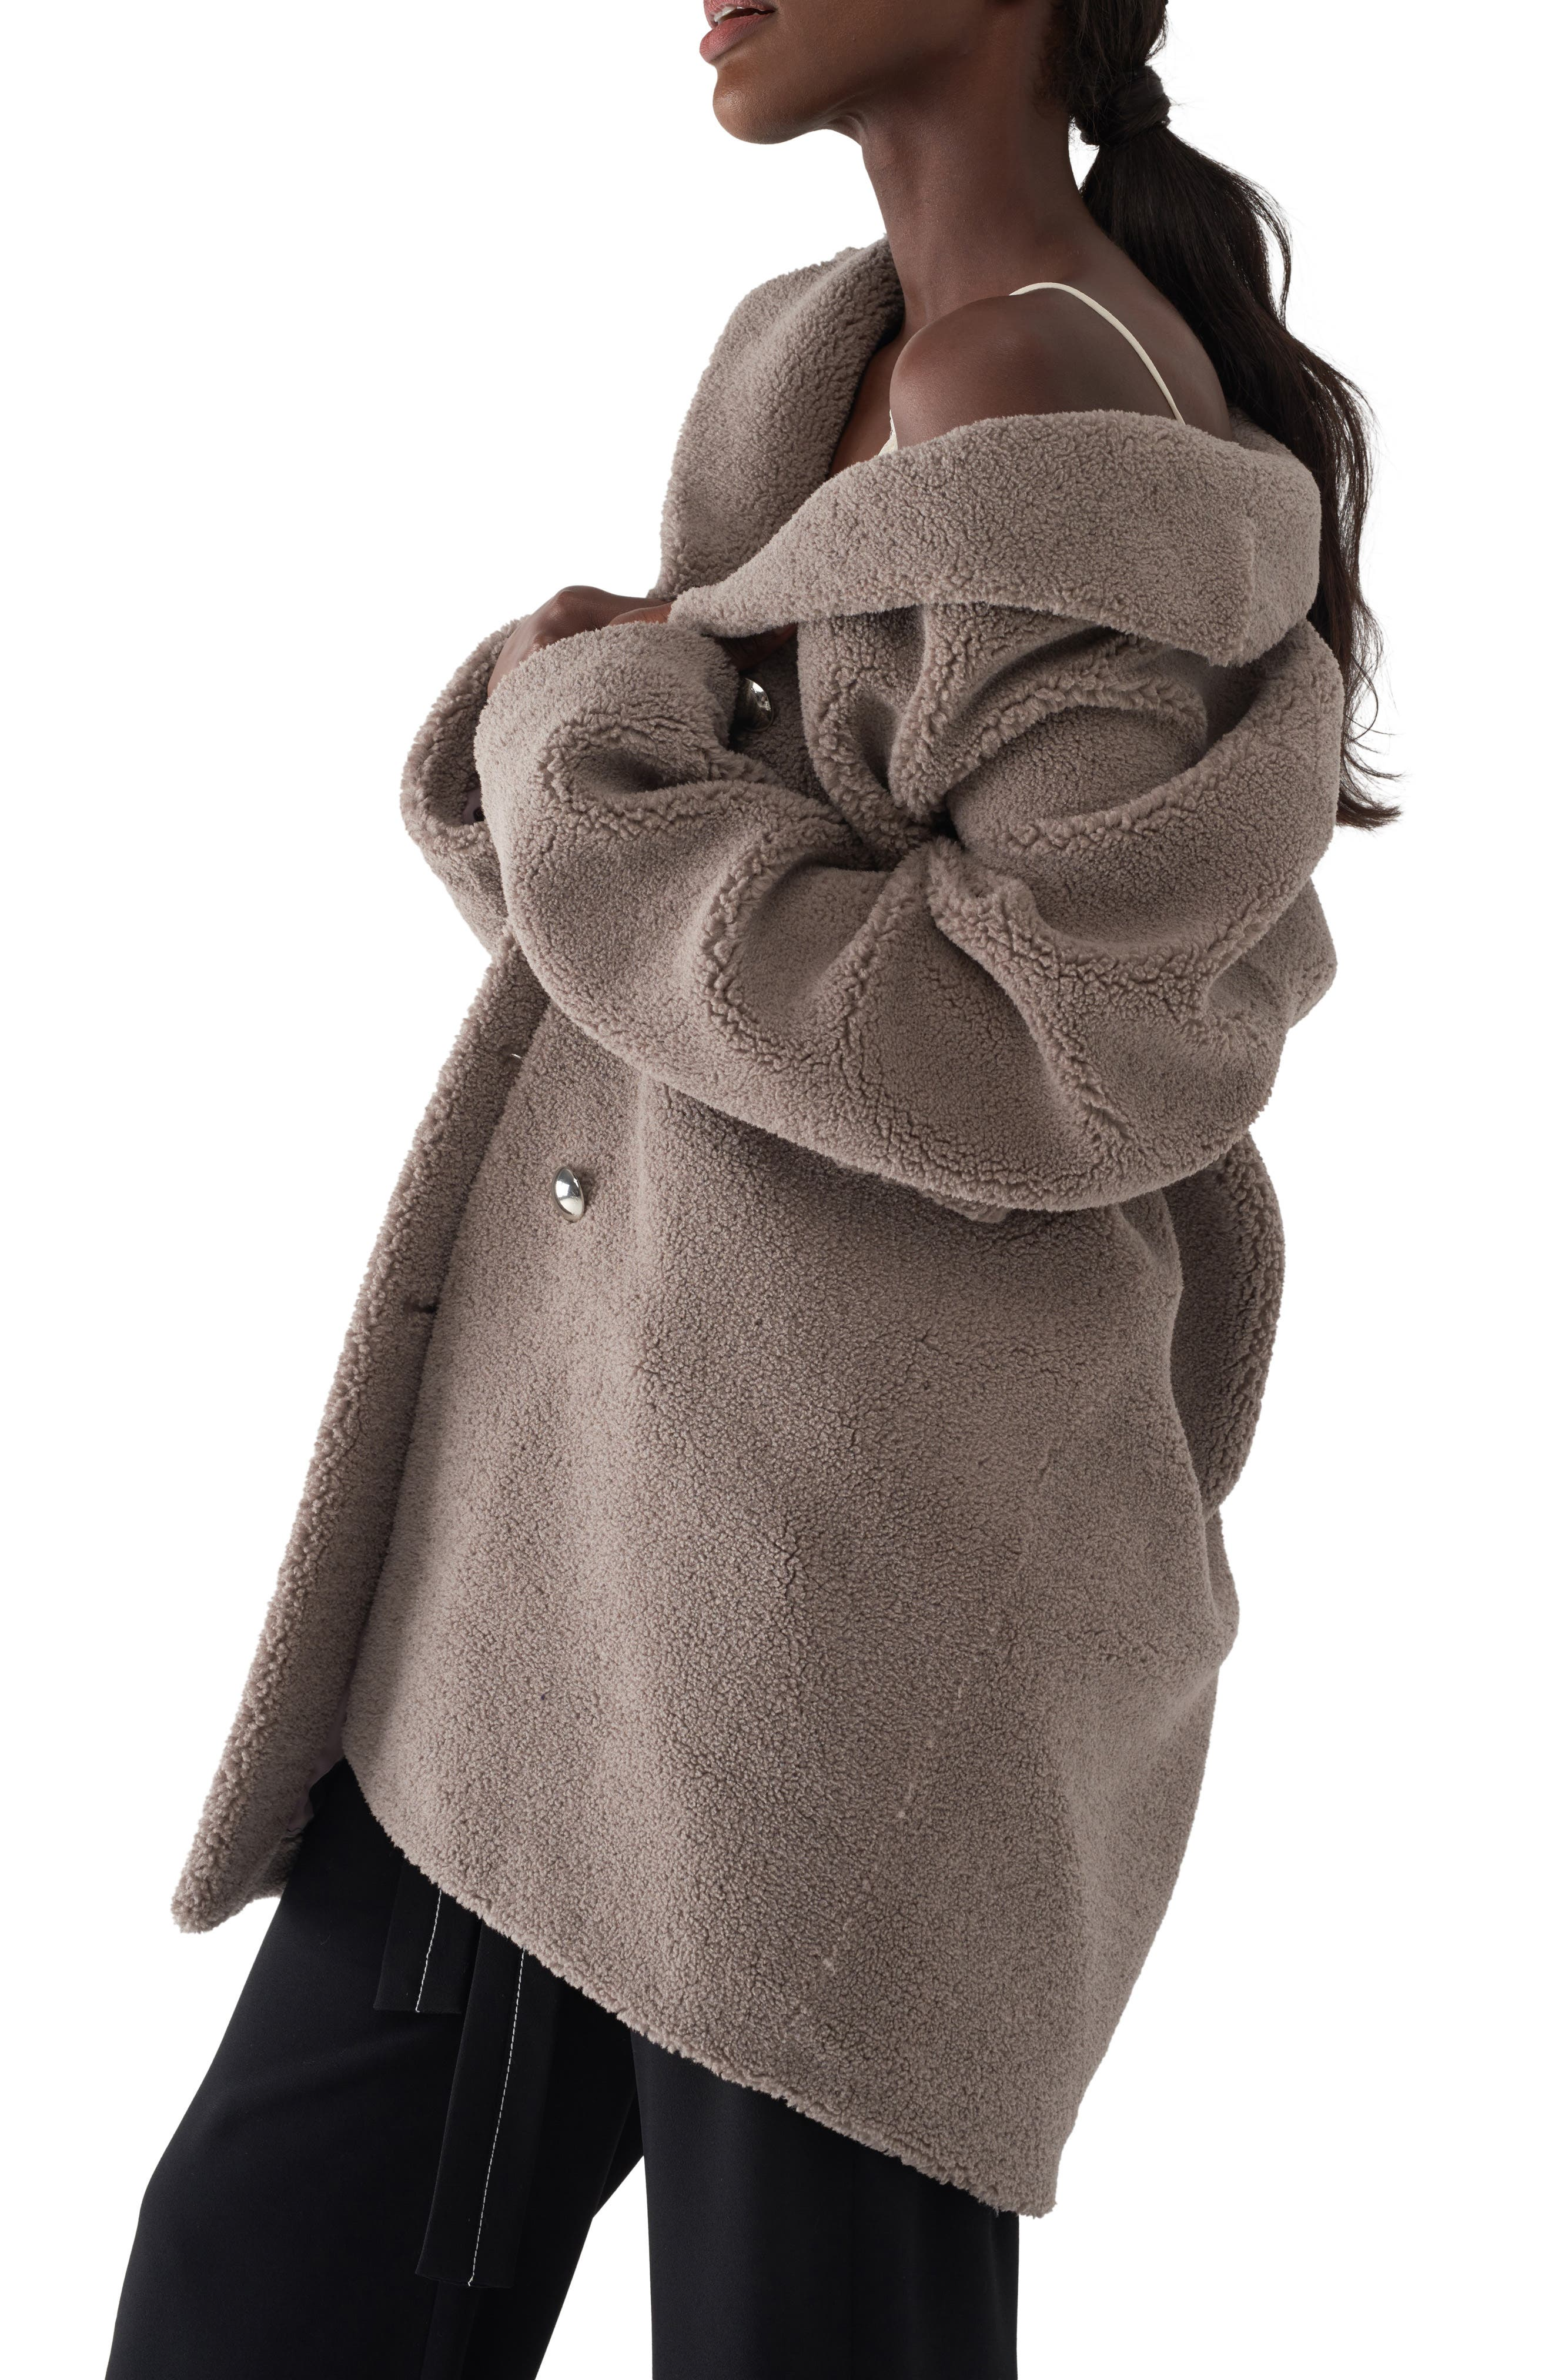 SOSKEN, Gita Teddy Coat, Alternate thumbnail 3, color, 256